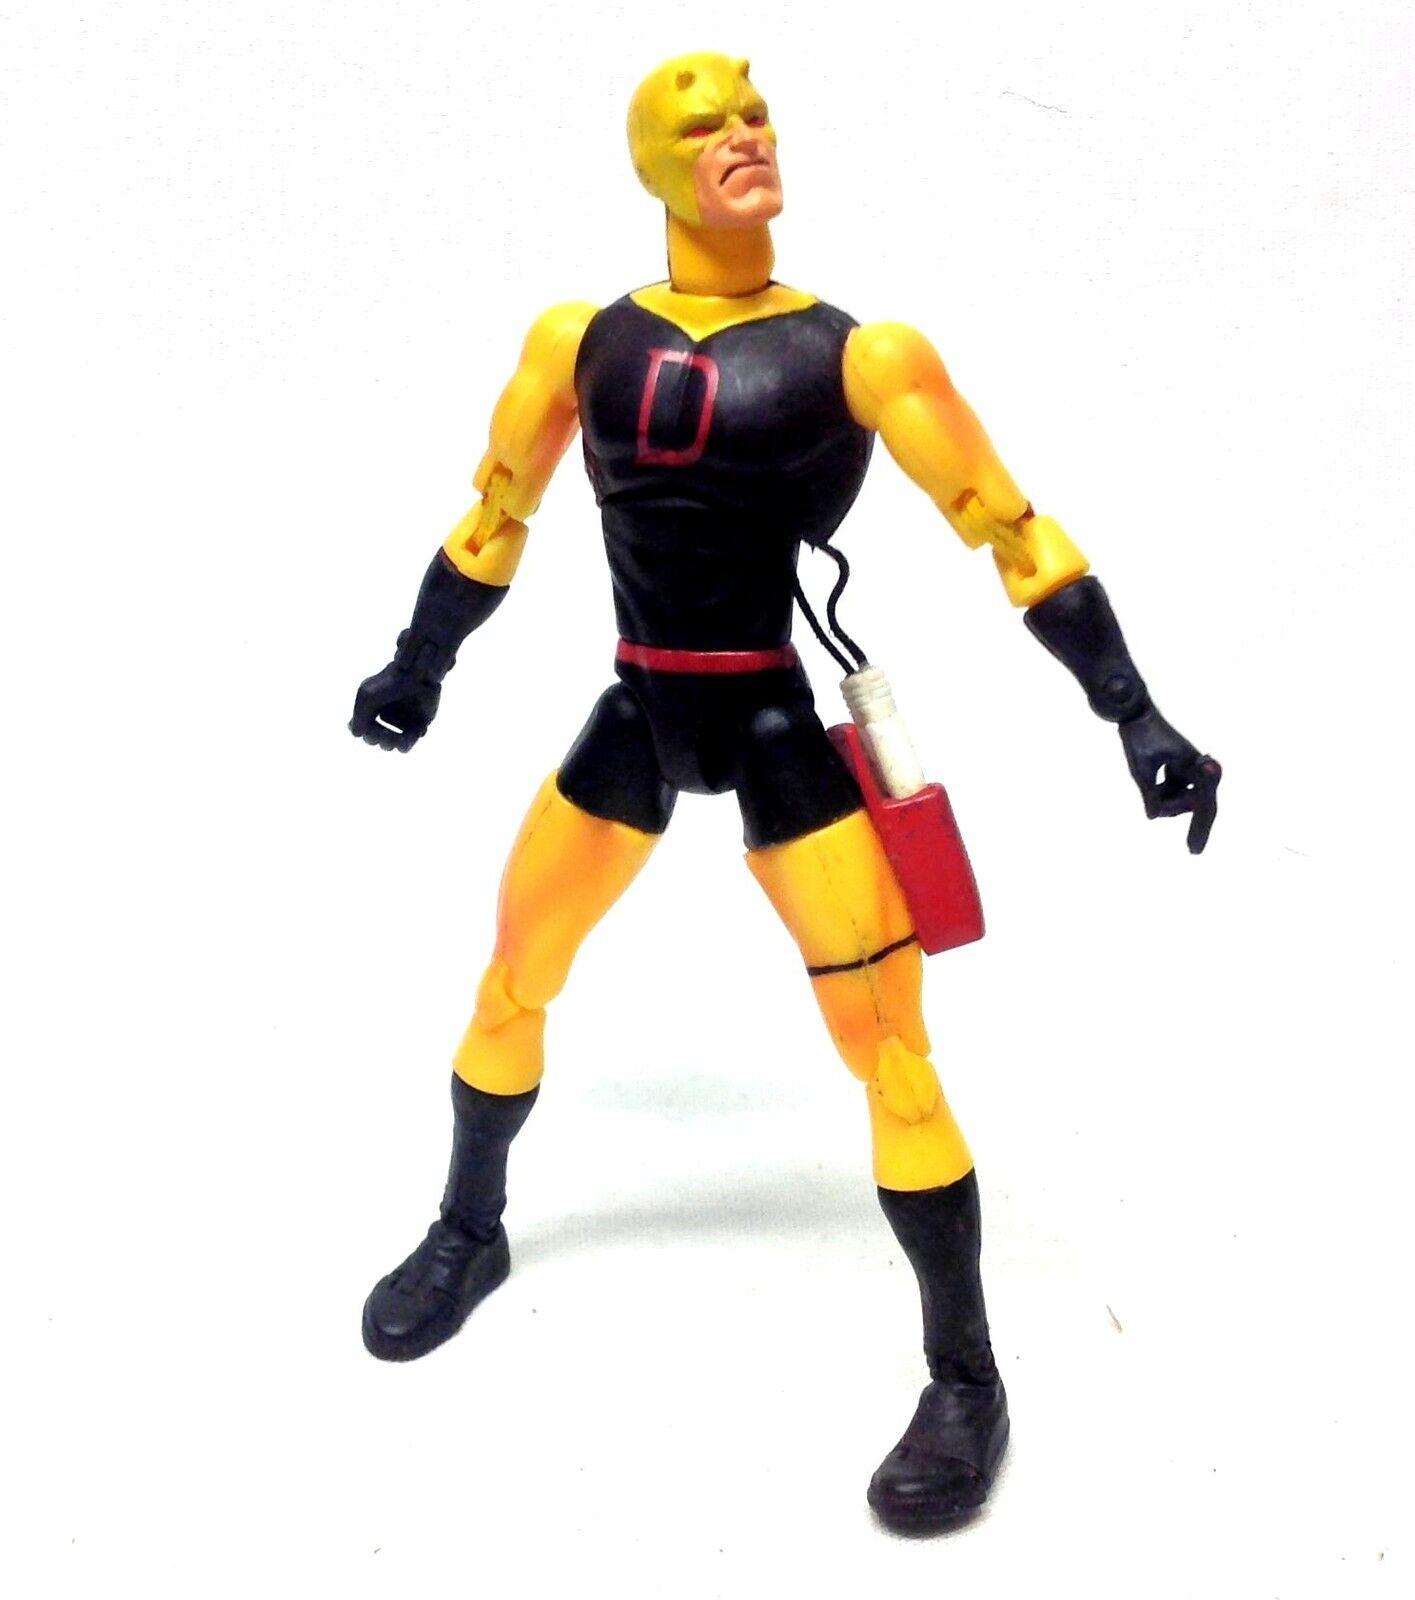 Marvel Marvel Marvel Comics Legends Classic 1st appearance DAREDEVIL 6 figure netflix, RARE 0153c2